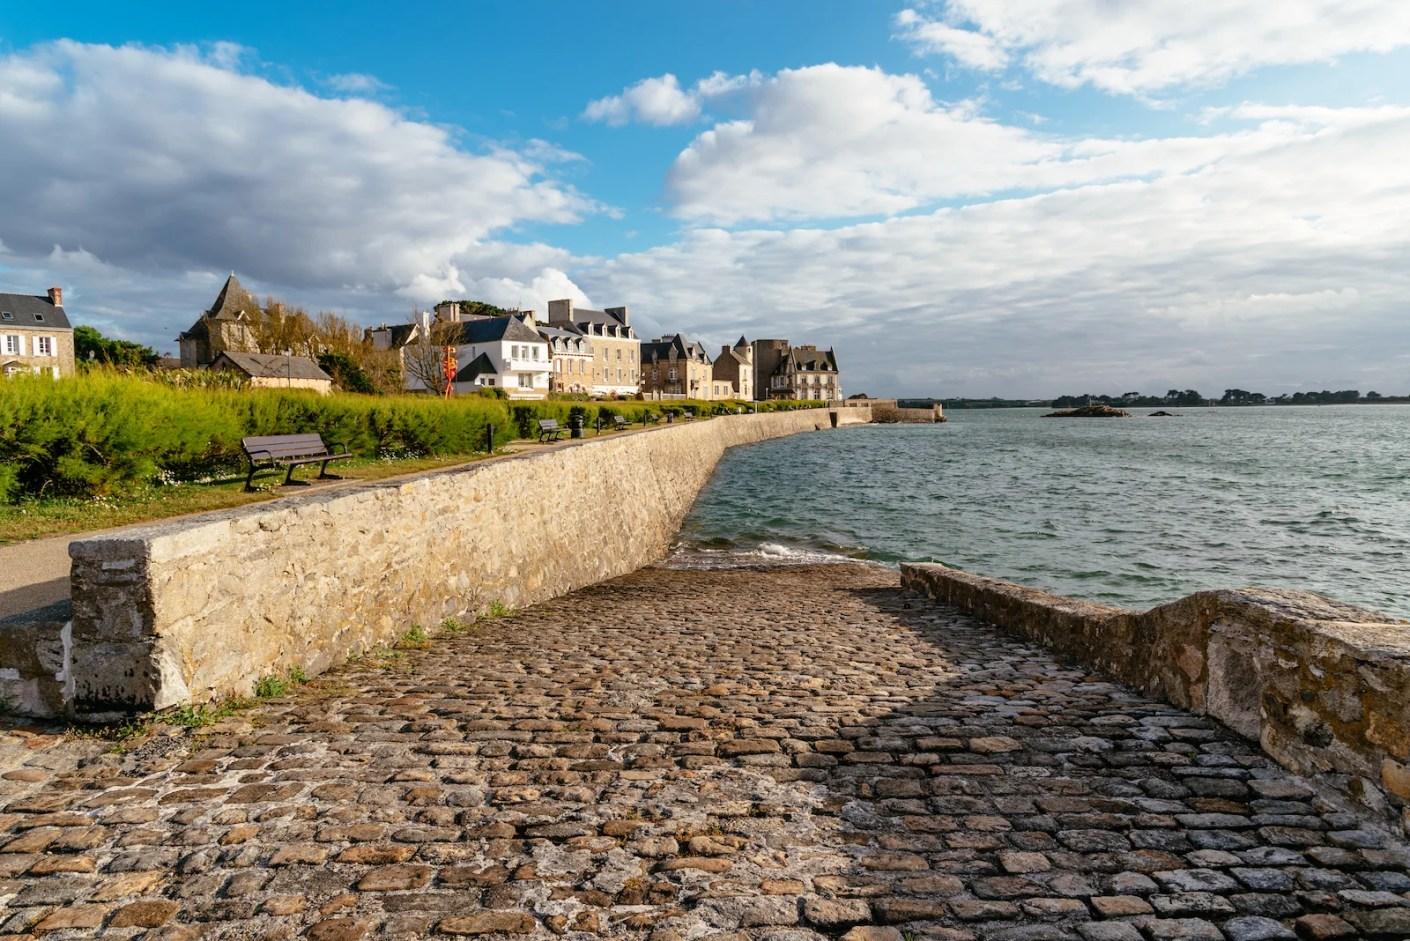 Waterfront of Roscoff on the Ile of Batz. (Photo by JJFarq / Shutterstock)